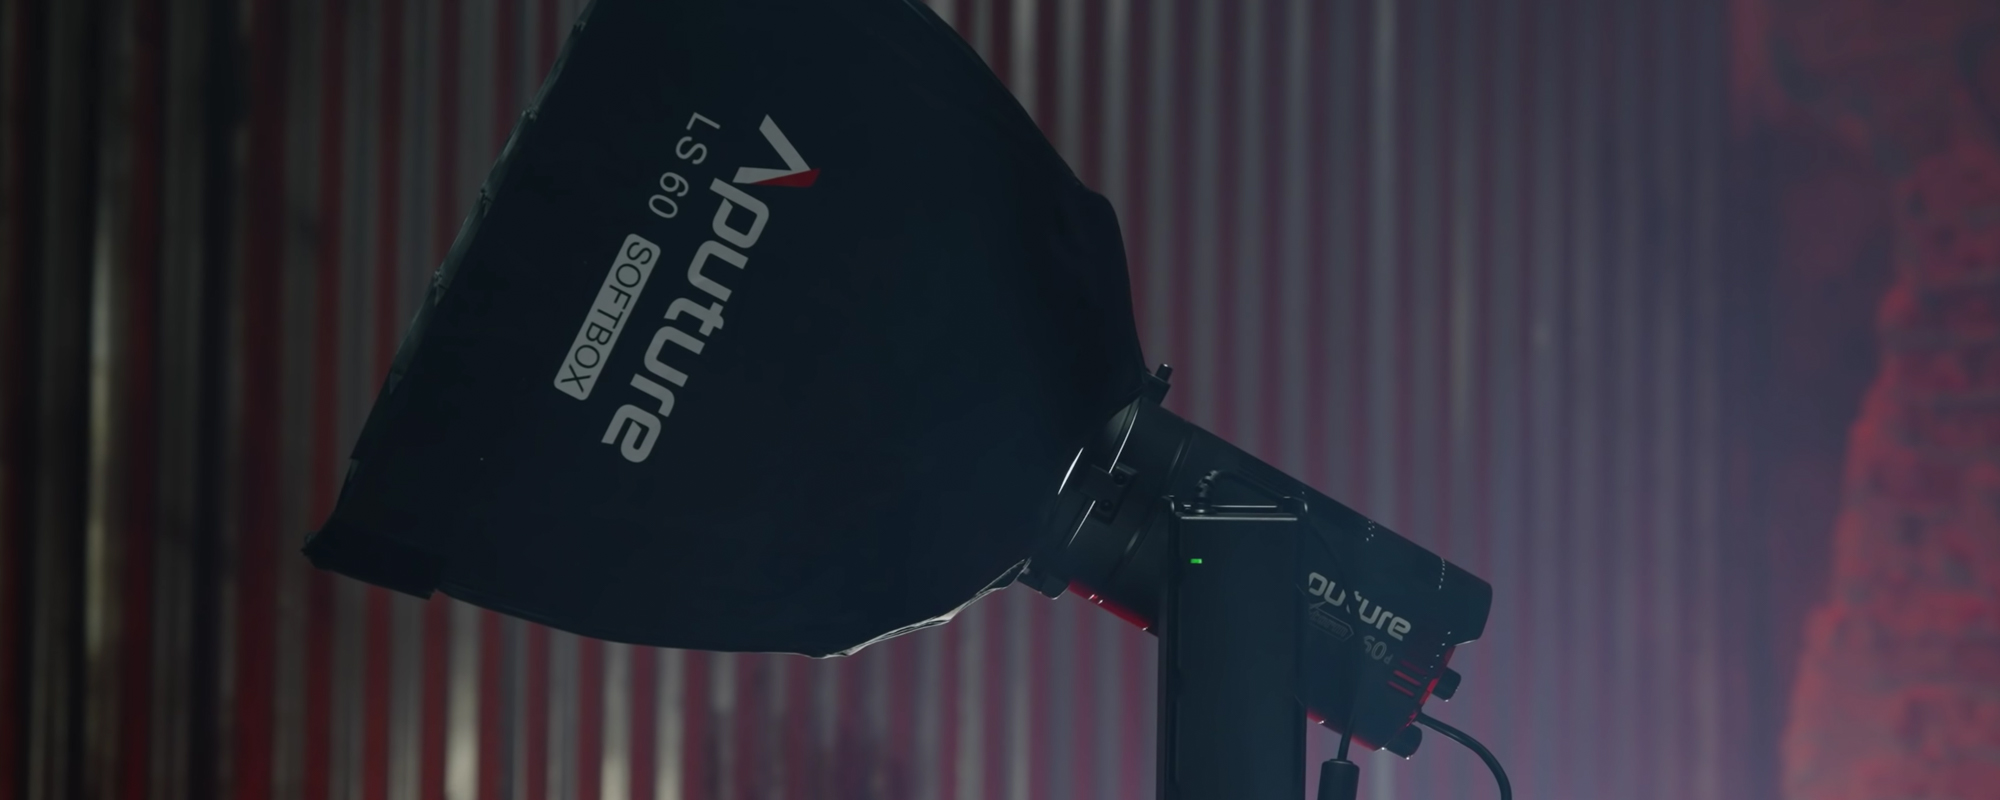 softbox LS 60 do lampy LED Aputure Light Storm LS 60d i LS 60x